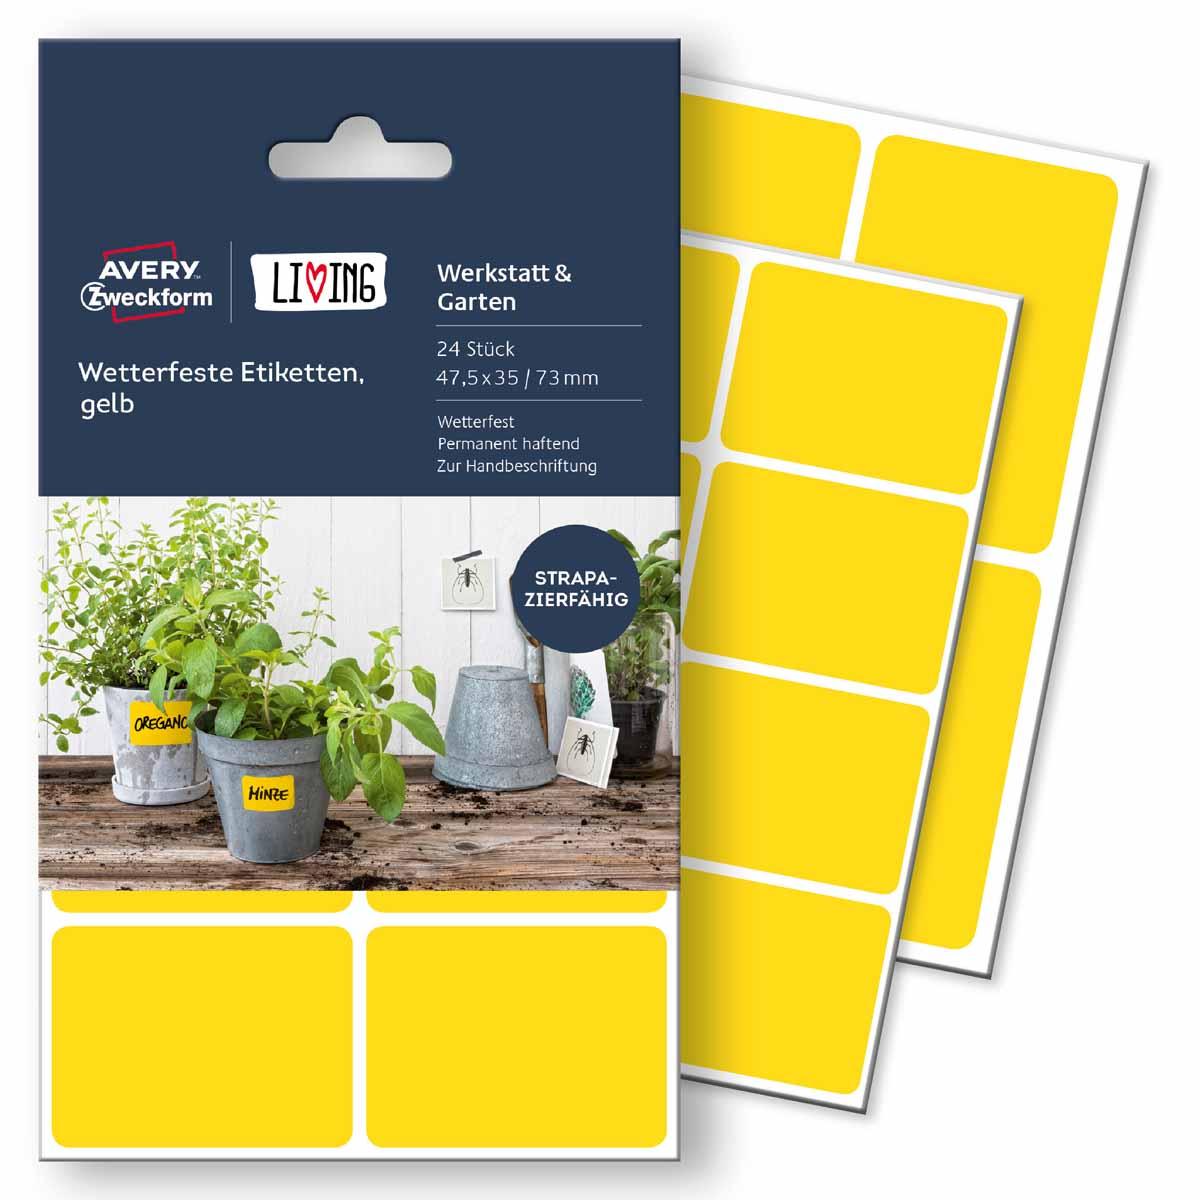 Avery Zweckform Этикетки для дома Living 47,5 х 35 мм цвет желтый